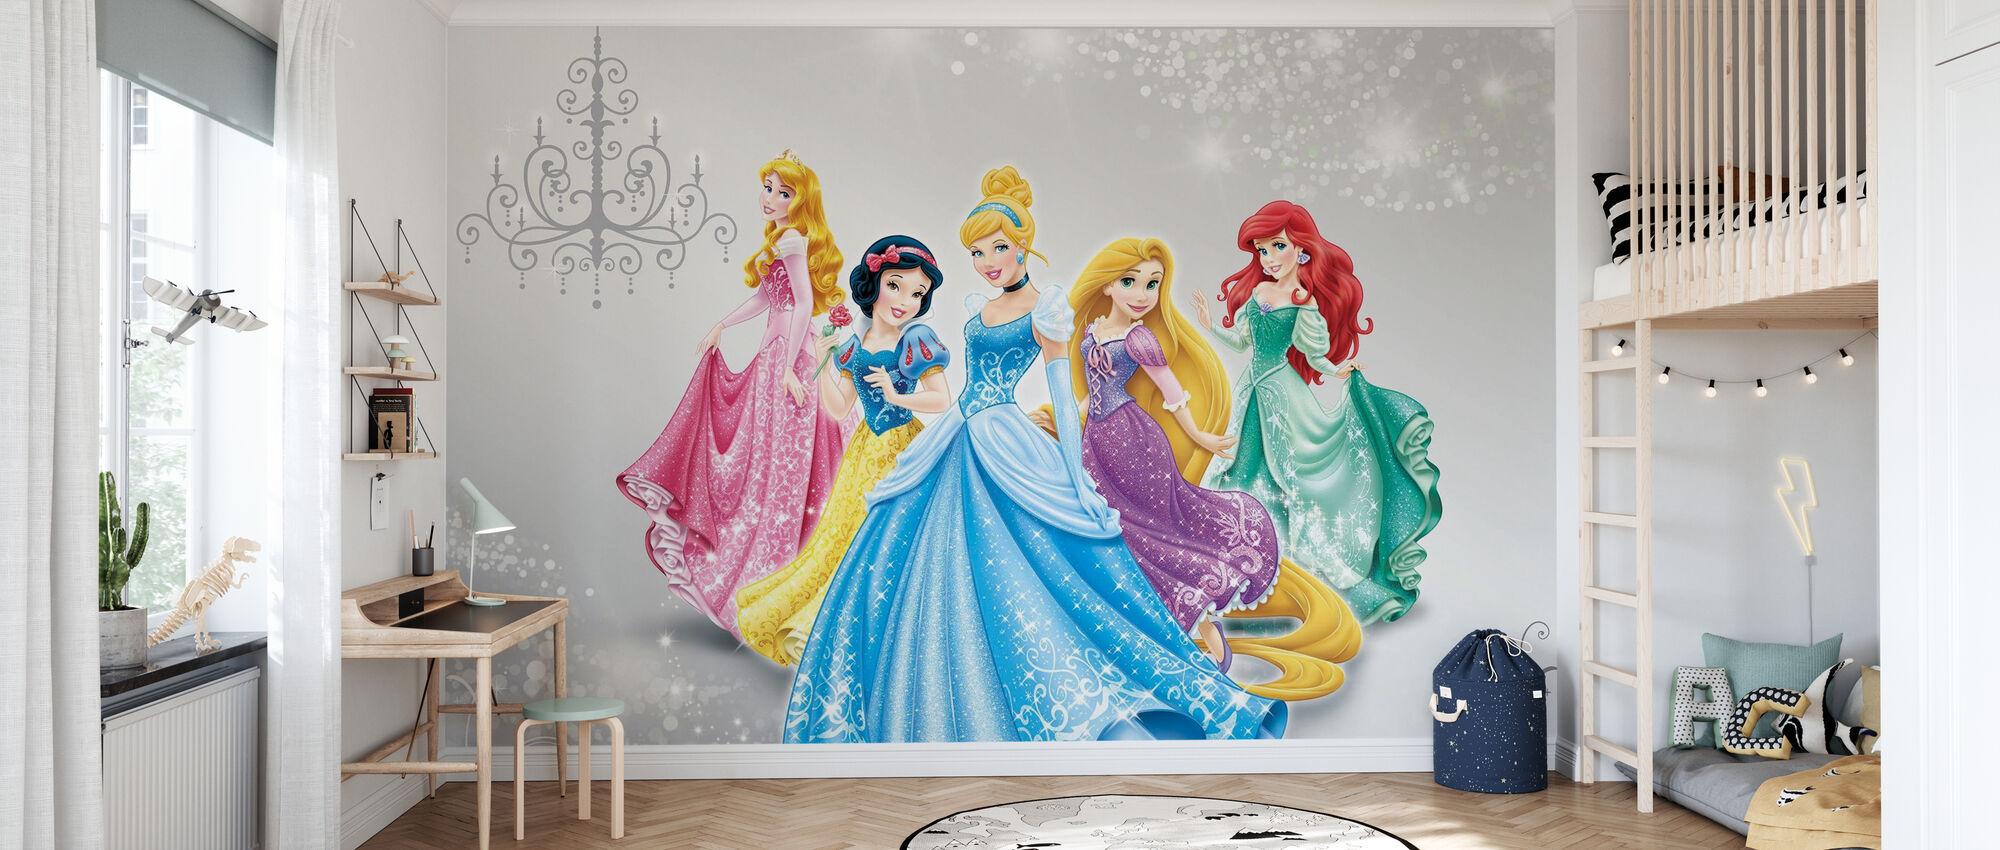 Disney Princess - Tapet - Barnrum